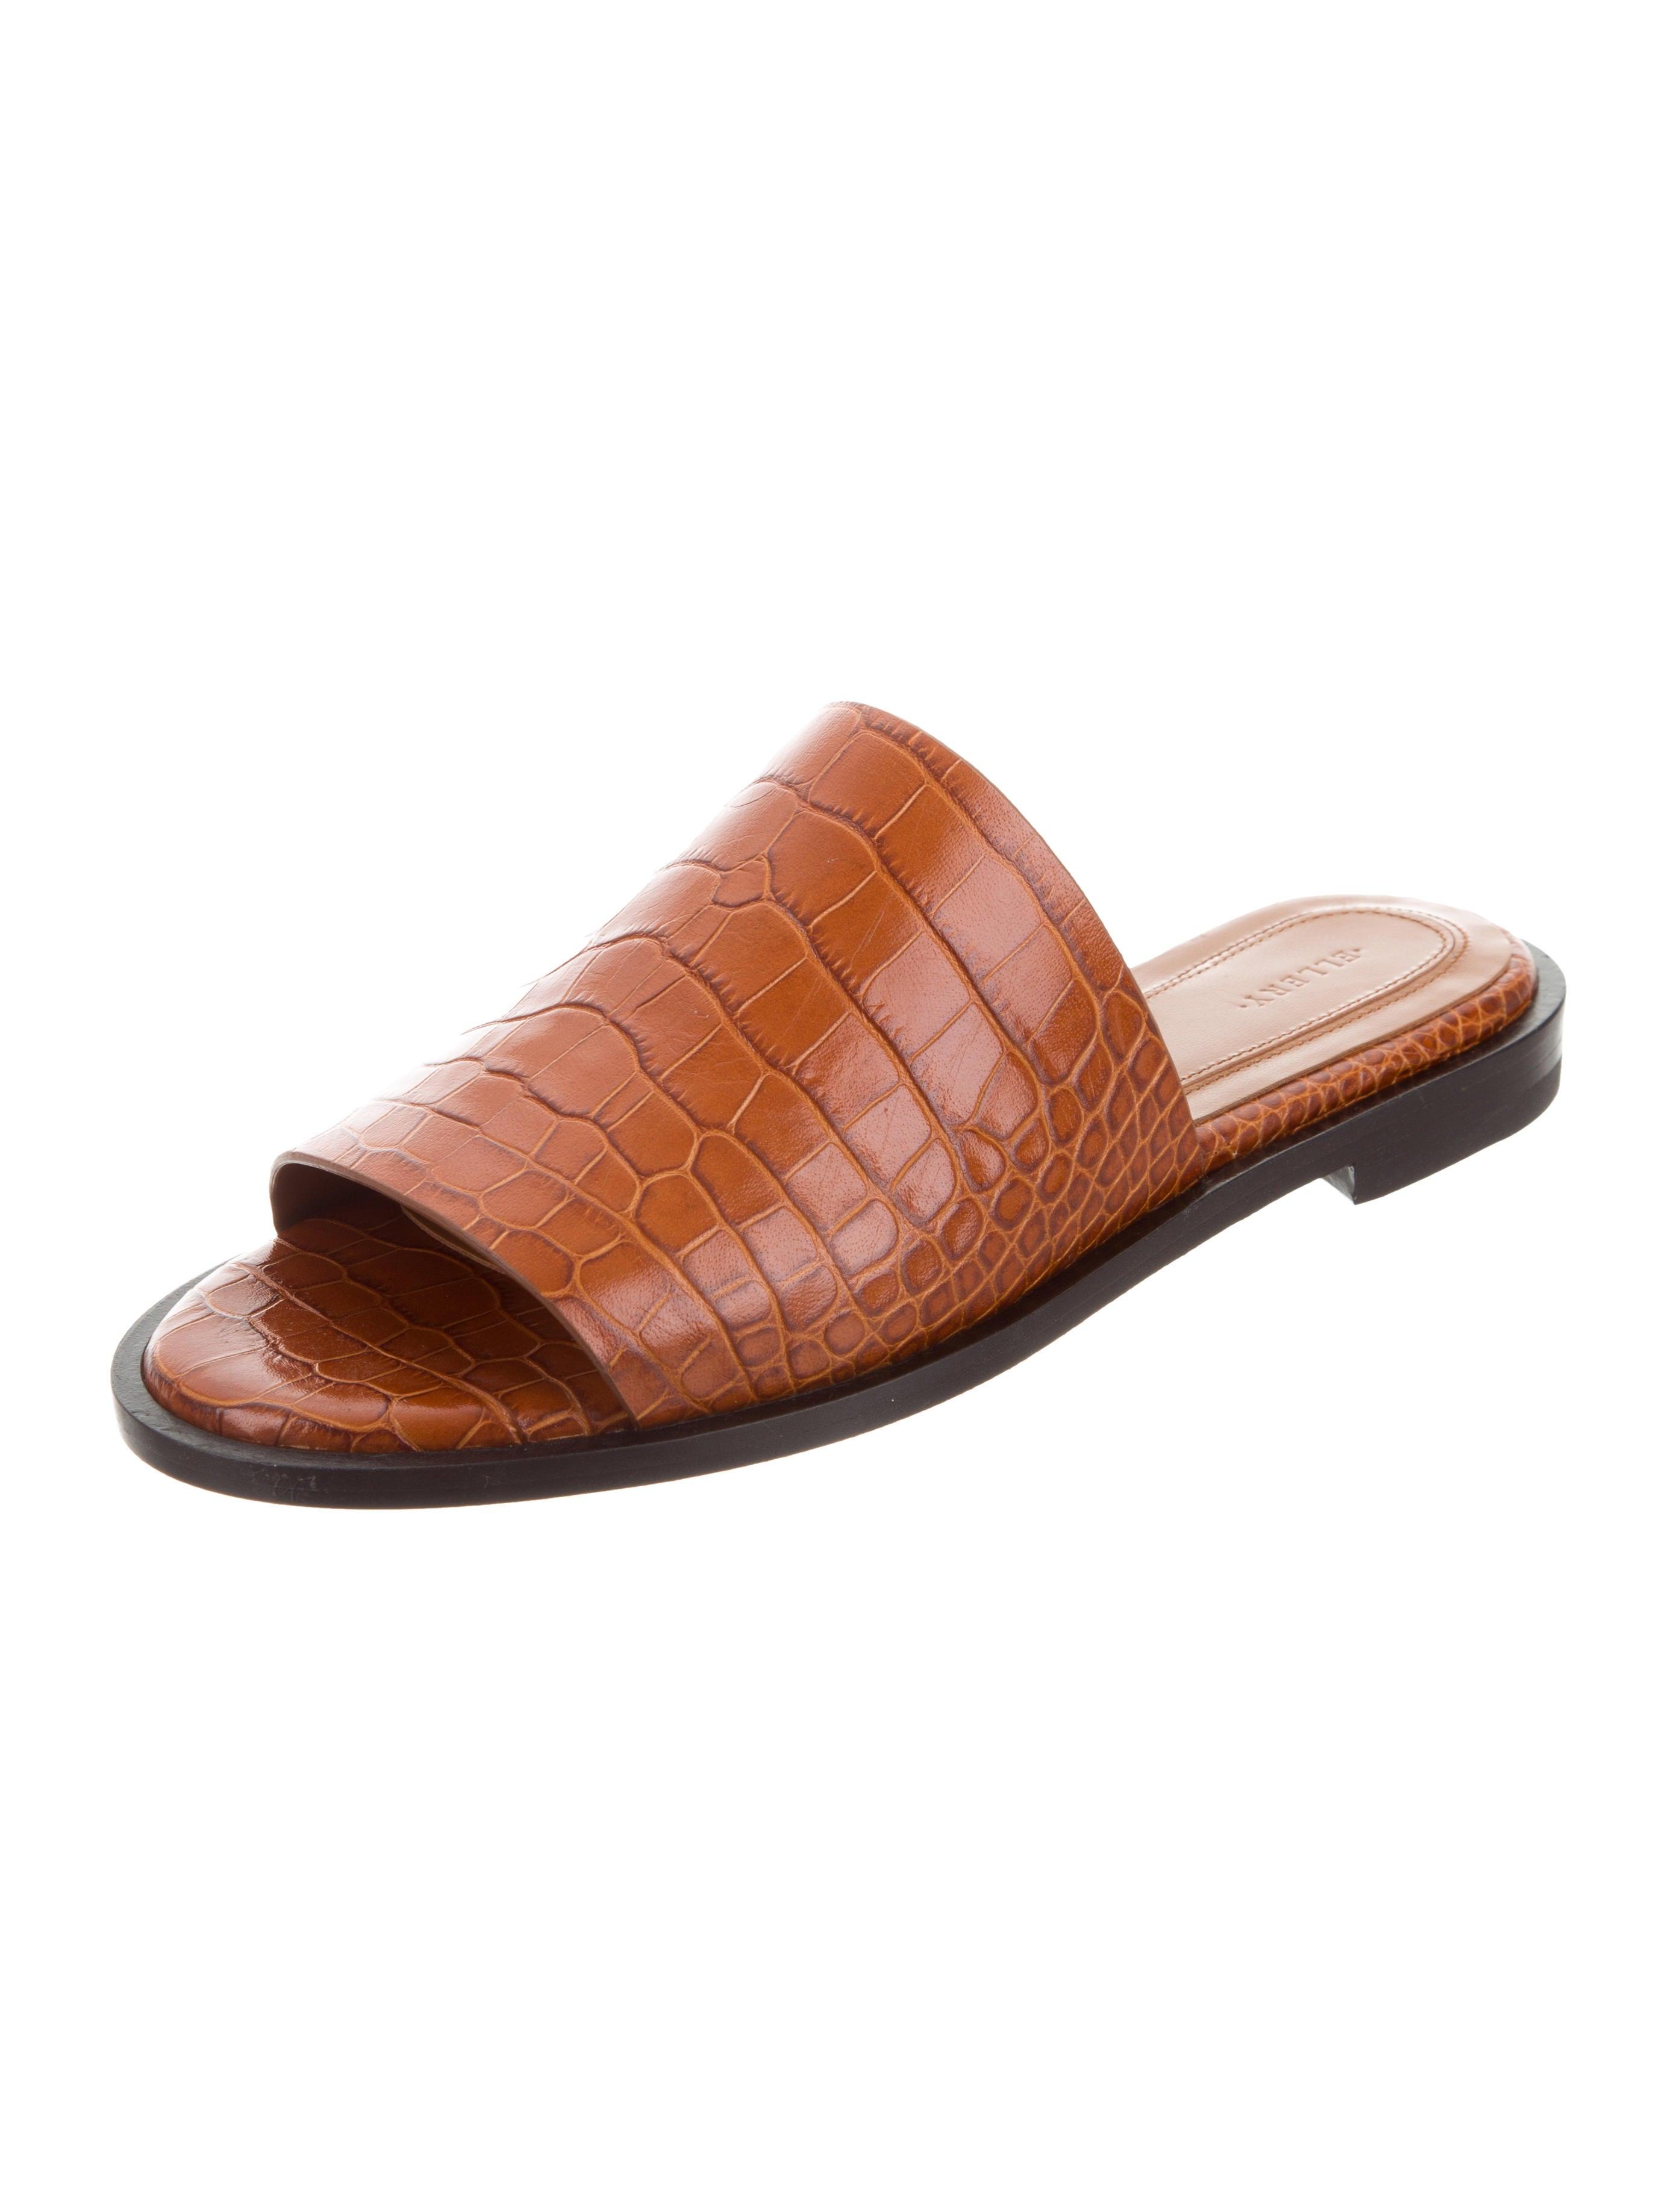 Ellery Funplex Slide Sandals w/ Tags cheap popular cheap release dates feJ0Byuy